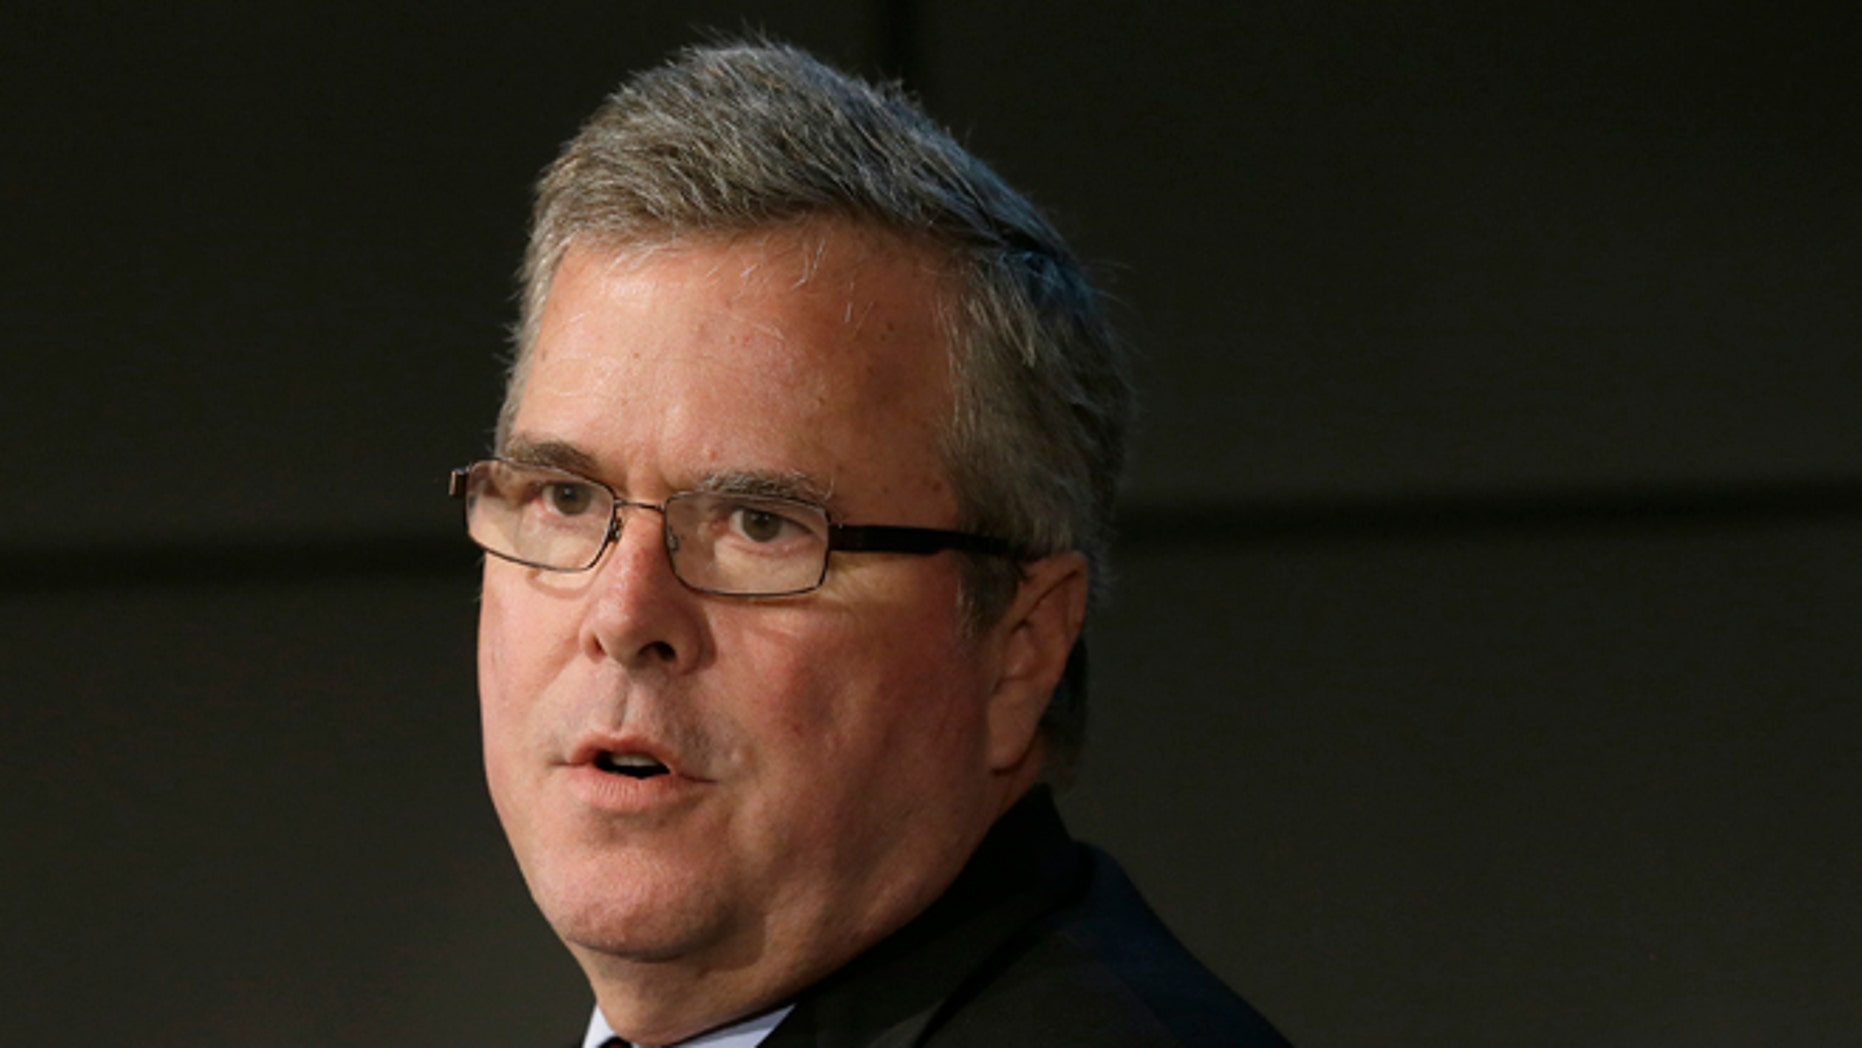 FILE: Jan. 14, 2014:  Former Florida Gov. Jeb Bush at a forum in Nashville, Tenn.